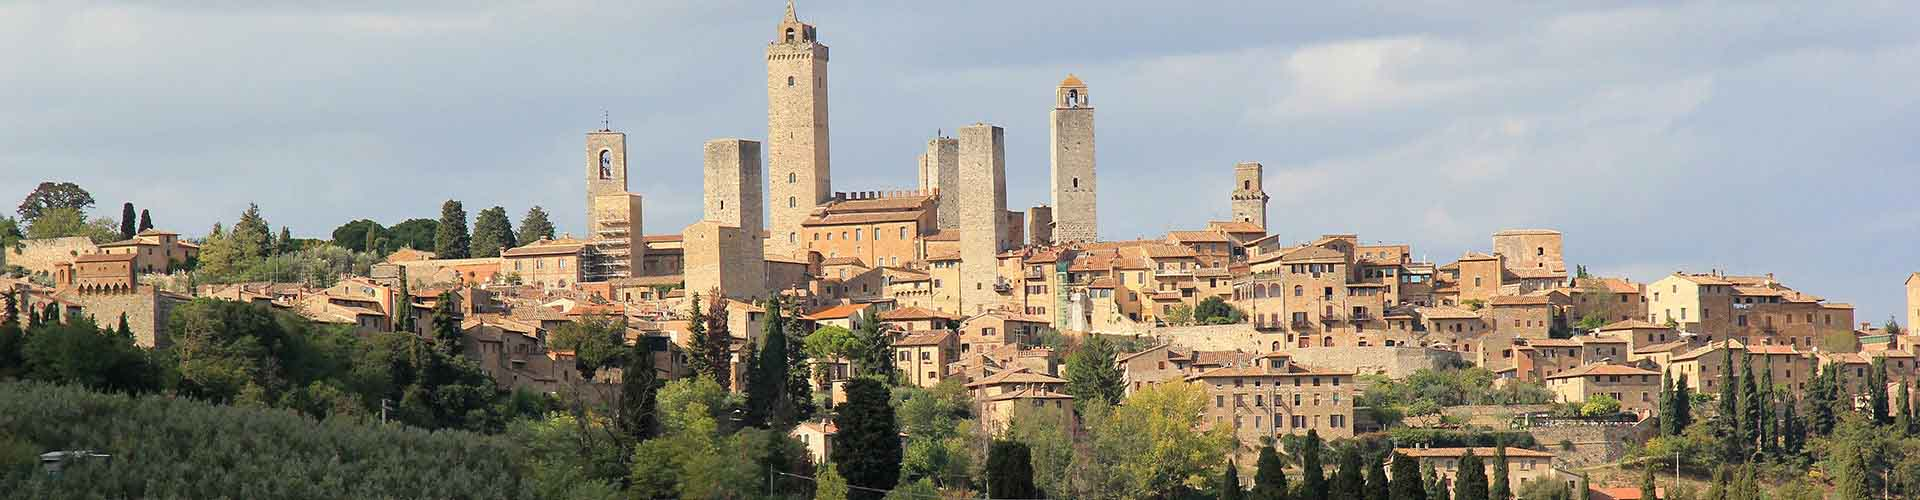 San Gimignano - Camping à San Gimignano. Cartes pour San Gimignano, photos et commentaires pour chaque Camping à San Gimignano.